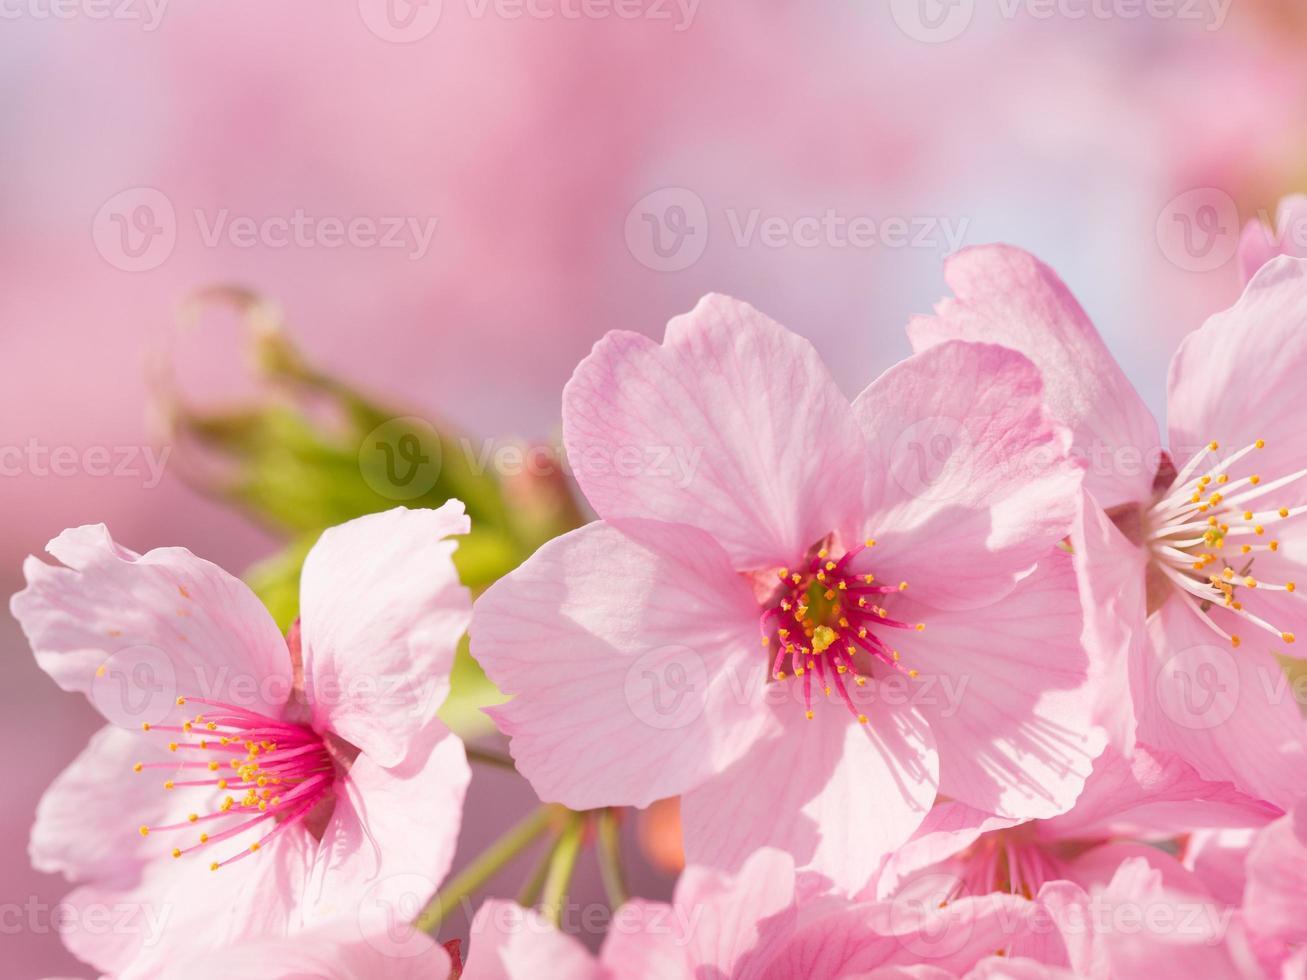 leuchtend rosa Kirschblüte foto